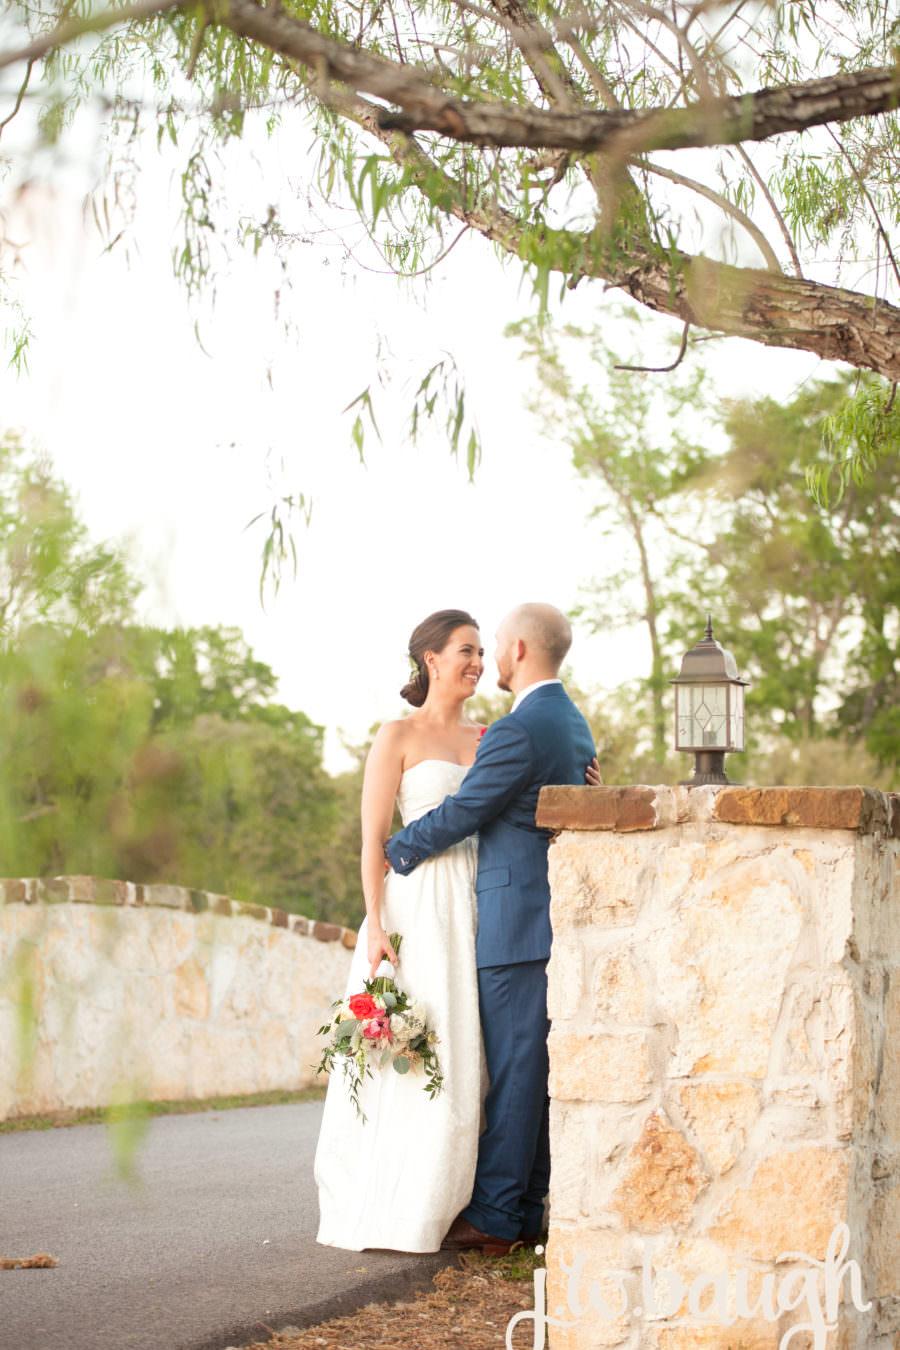 Chancey Charm Houston Venue Highlight, Balmorhea Events, Texas Wedding Venue, Houston Wedding Venue, Chancey Charm Houston, Houston Wedding Planner, Texas Wedding Planner